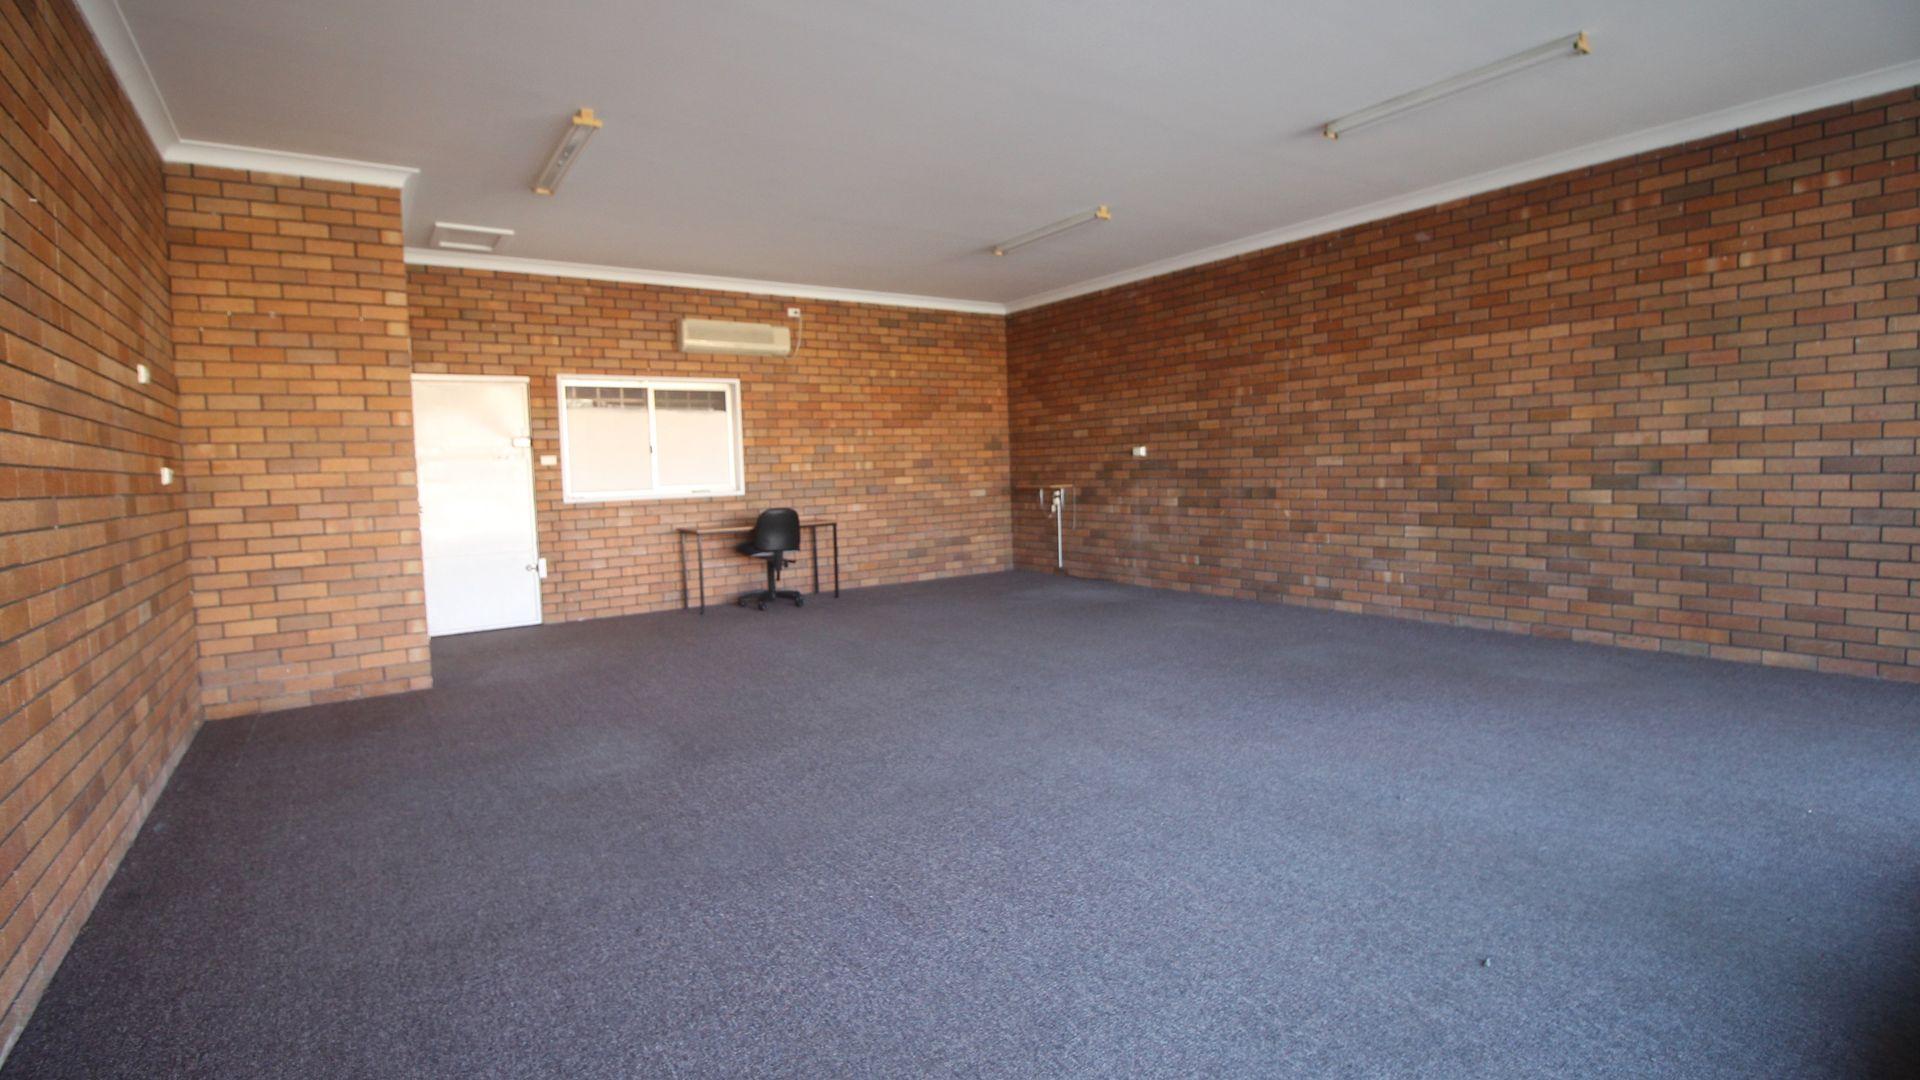 3/139 Maitland Street, Narrabri NSW 2390, Image 1